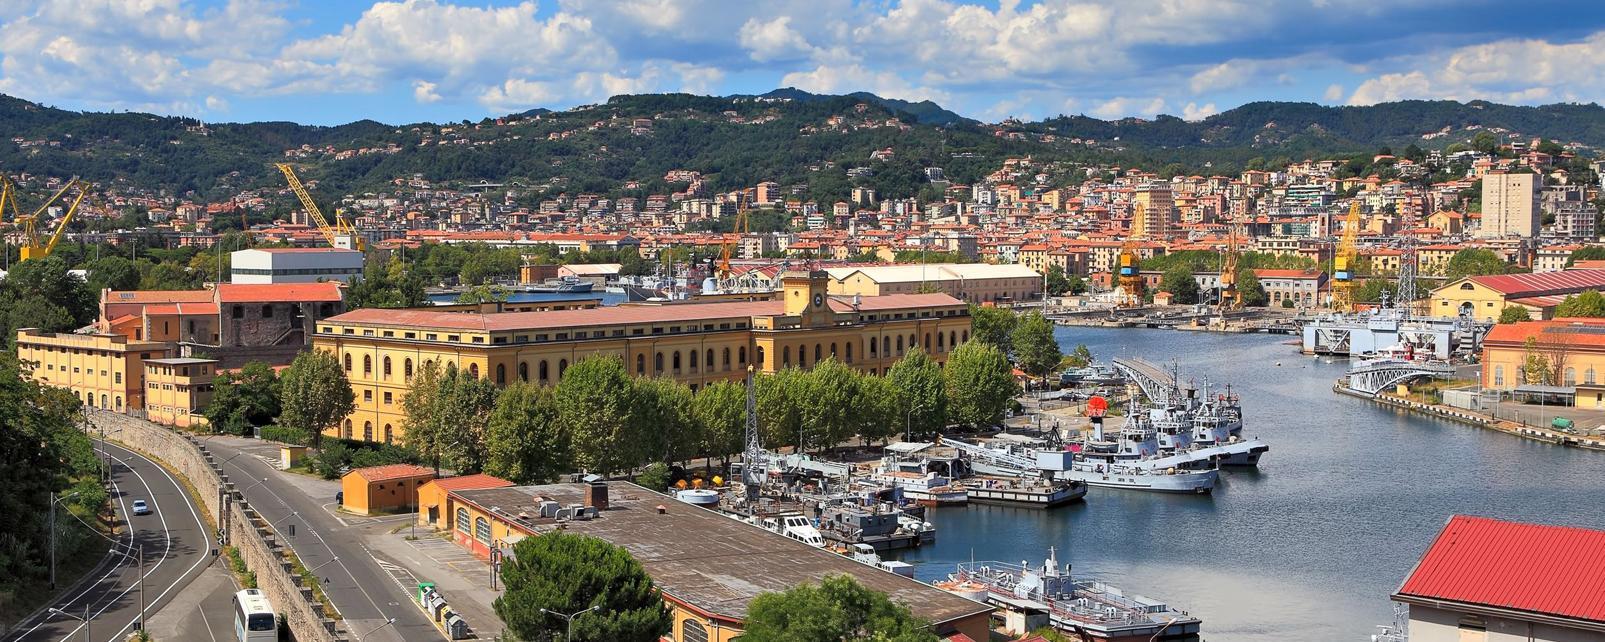 Travel to La Spezia Italy  La Spezia Travel Guide  Easyvoyage